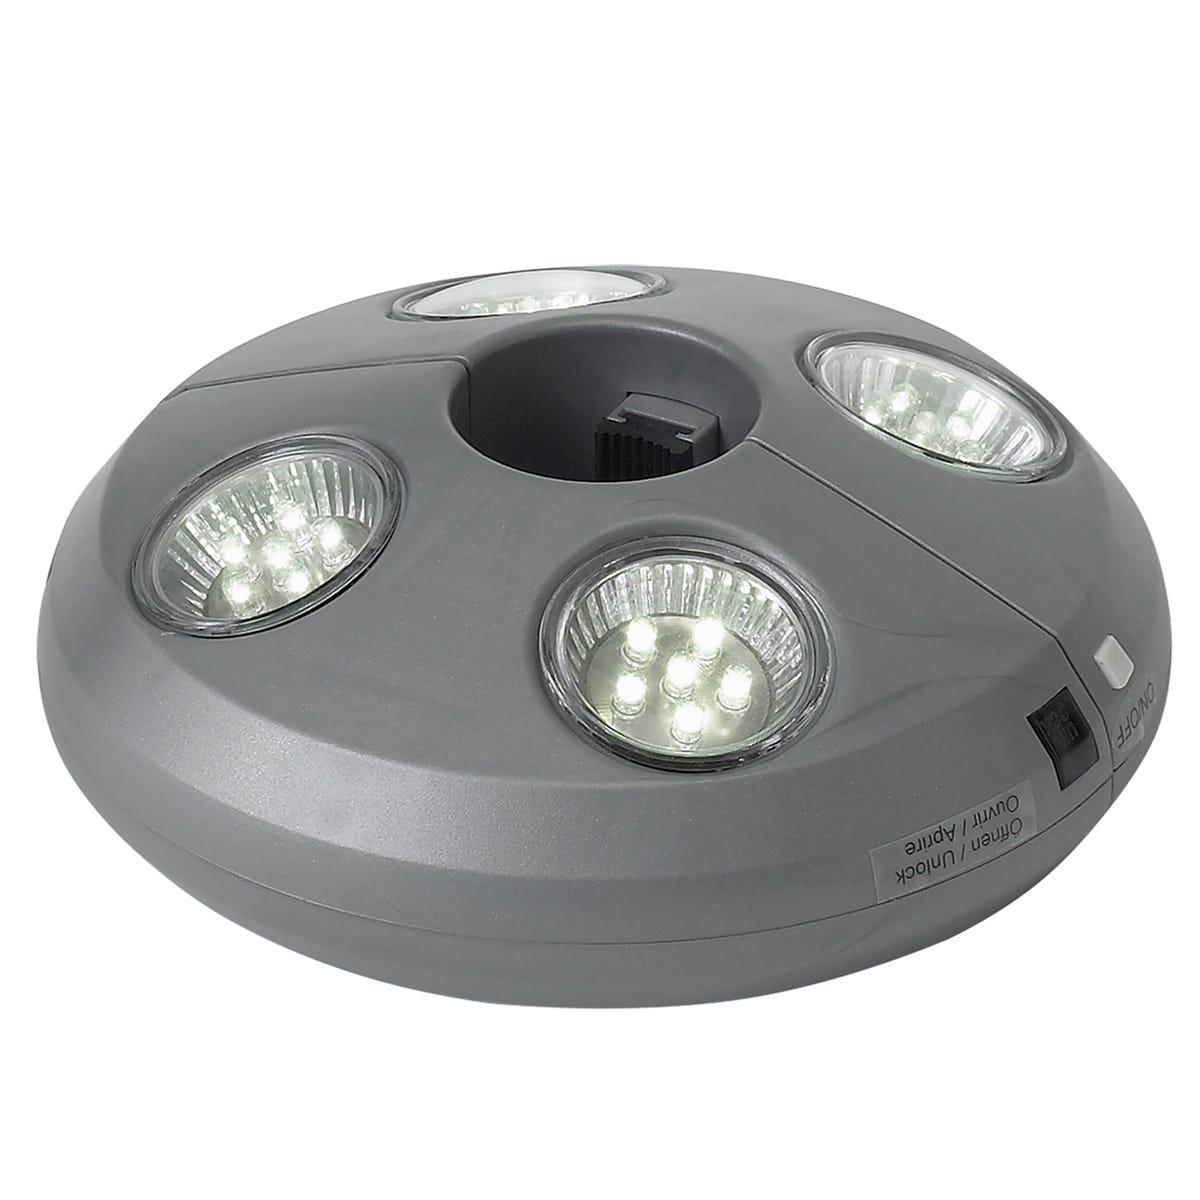 Glatz Osyrion 4 Lamp Rechargeable LED Parasol Light